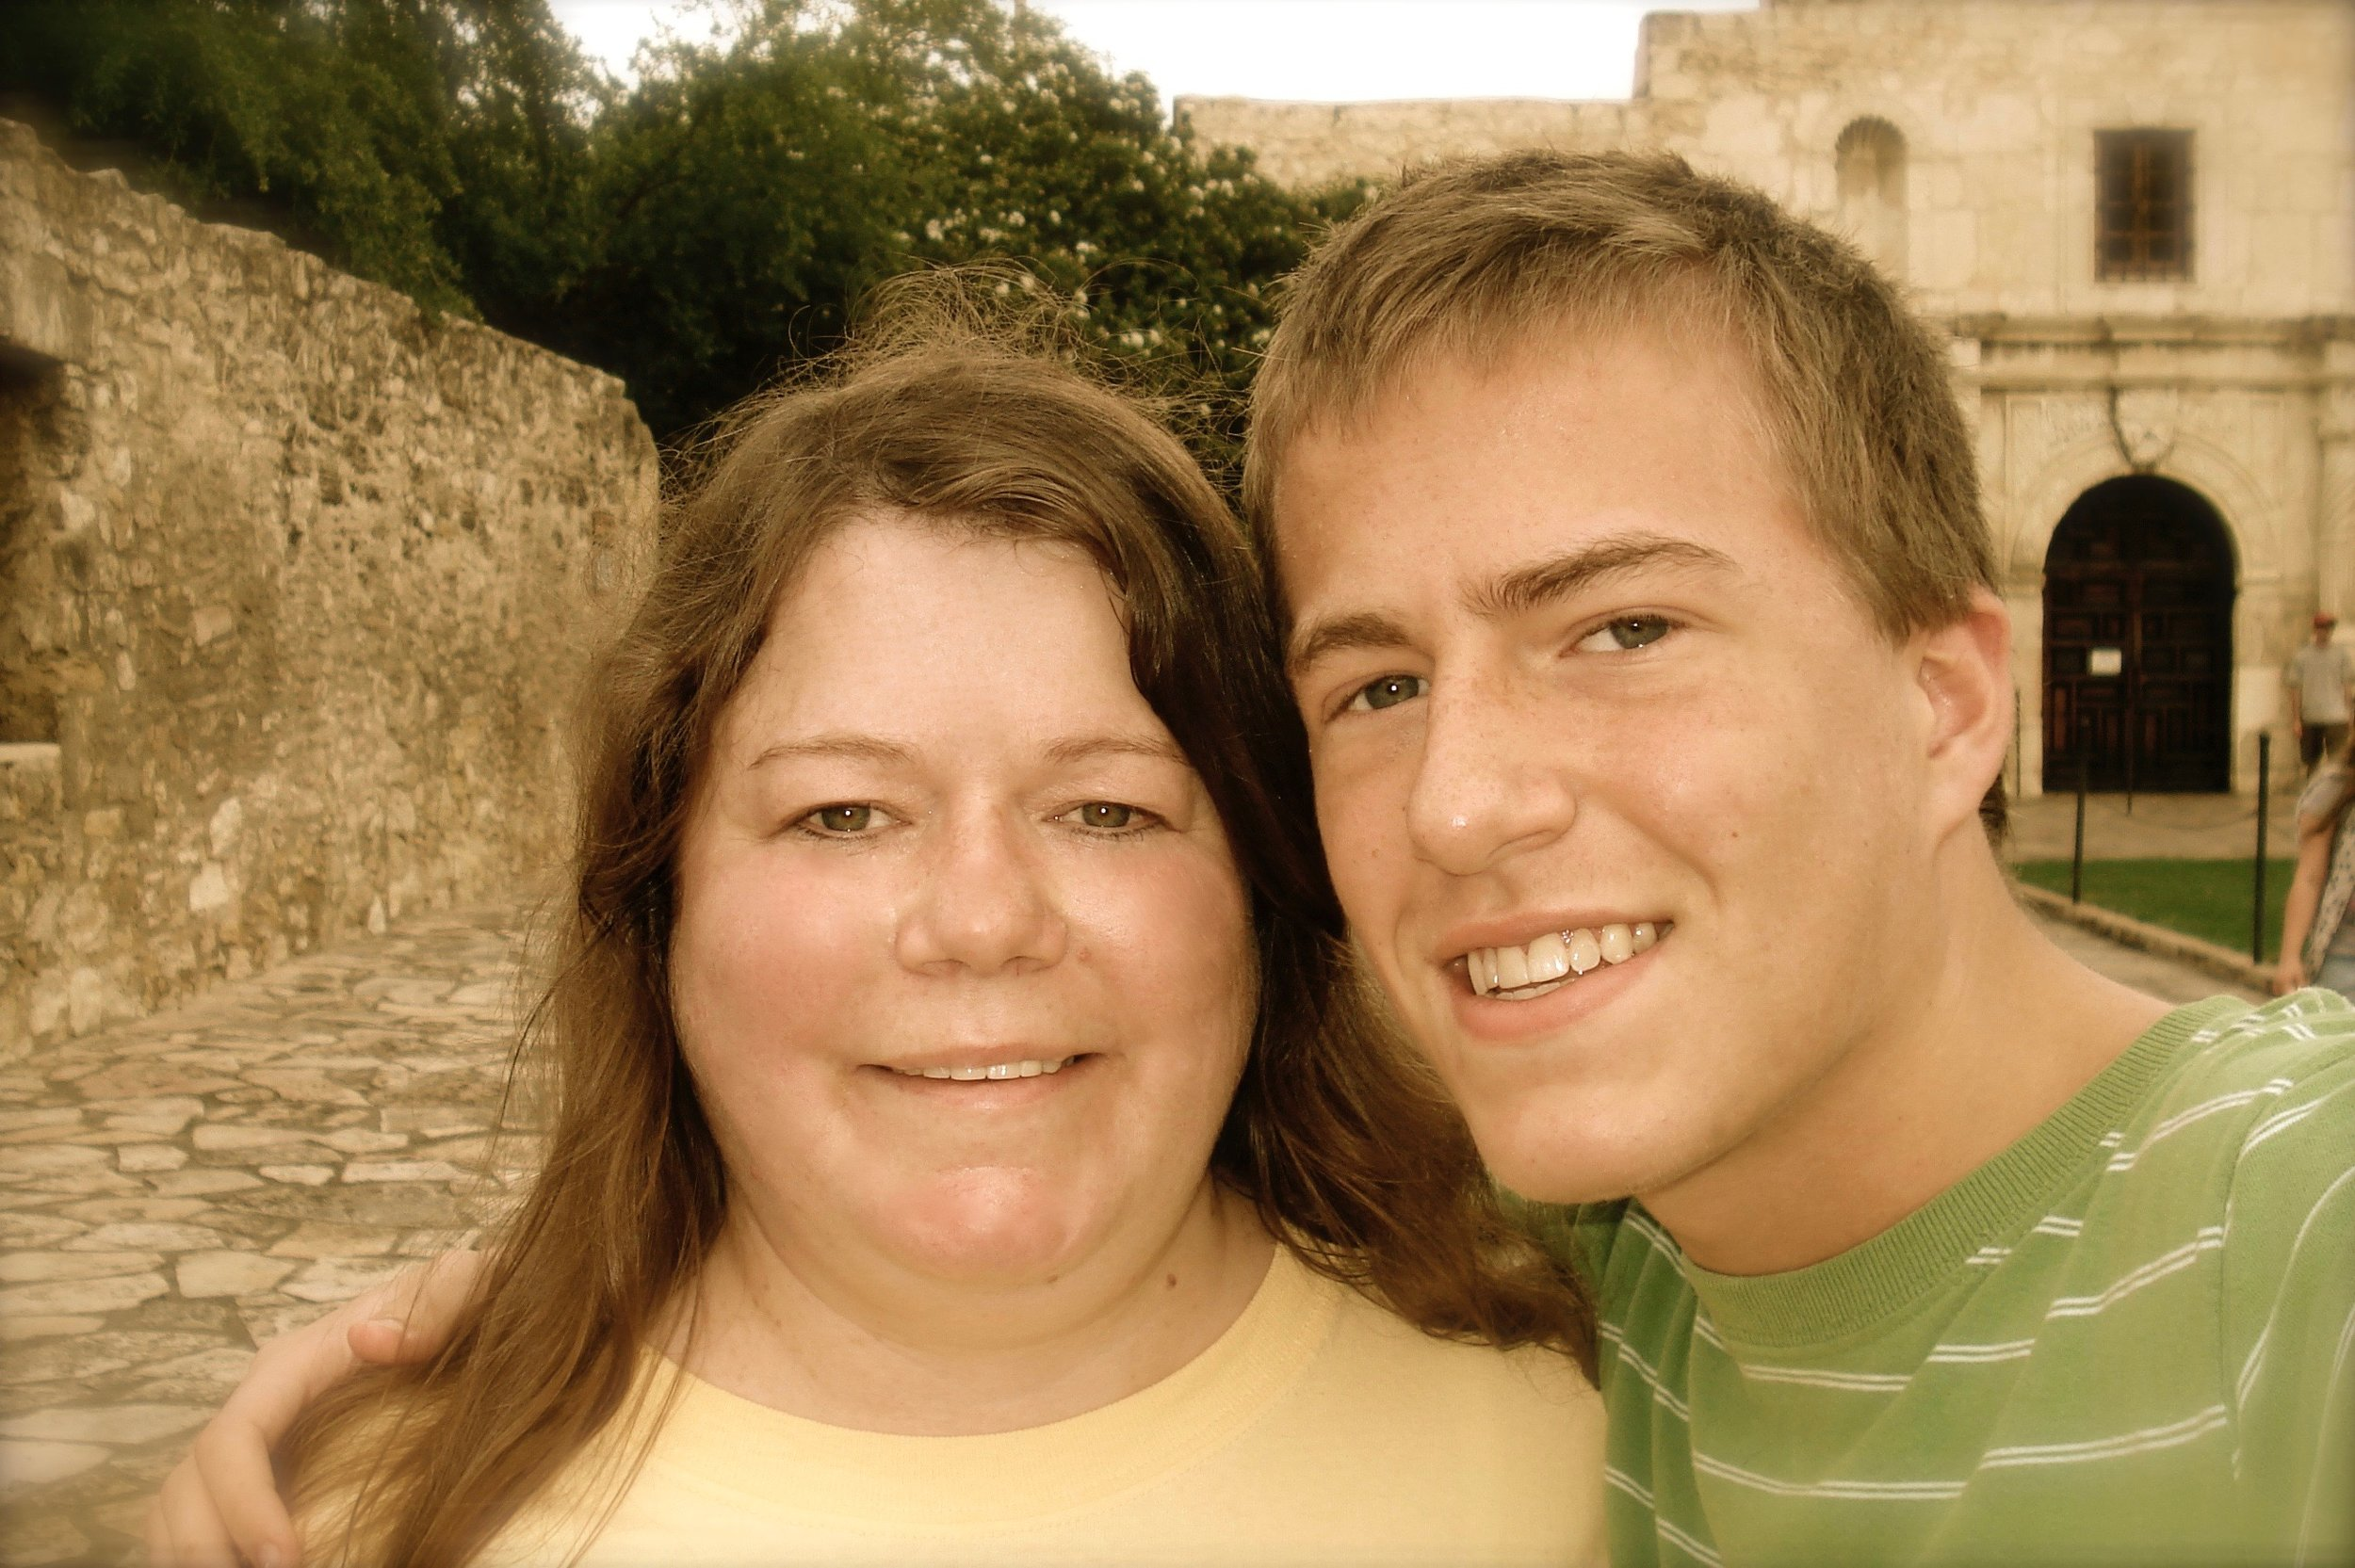 My mother and I. Photo taken at the Alamo in San Antonio, TX, circa 2009.